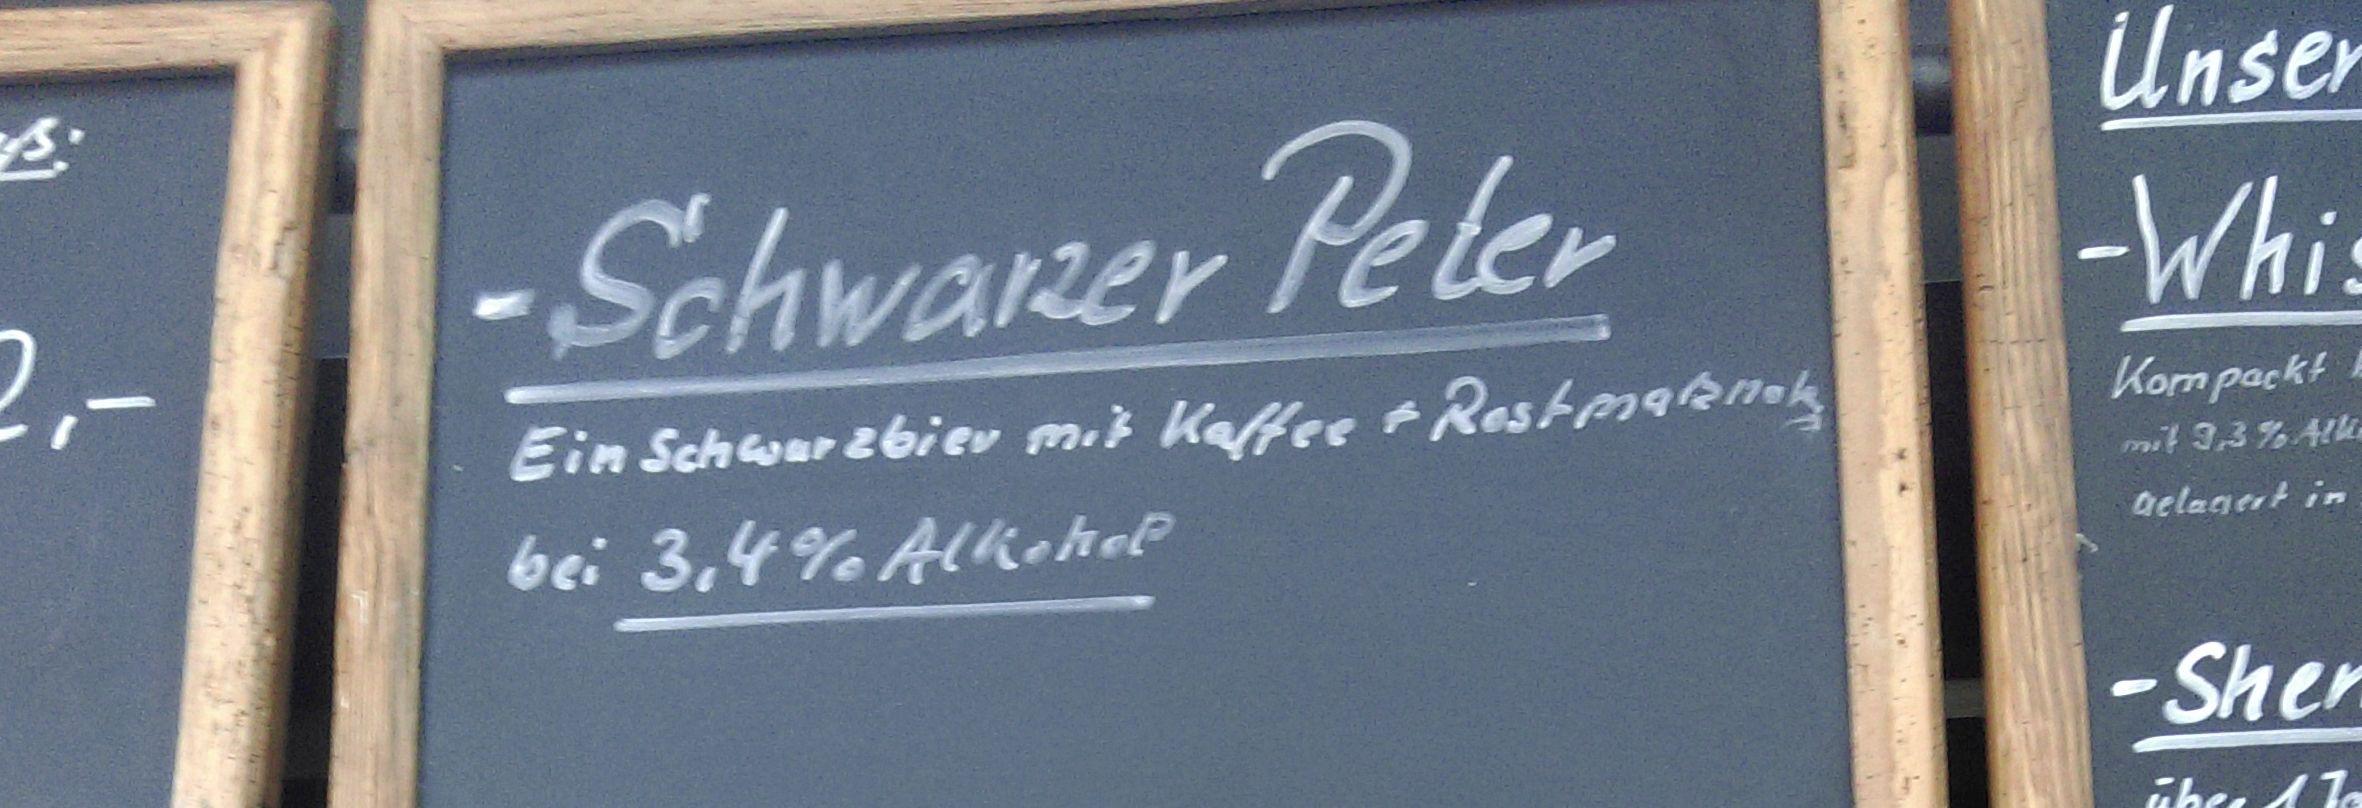 schwarzer-peter-1